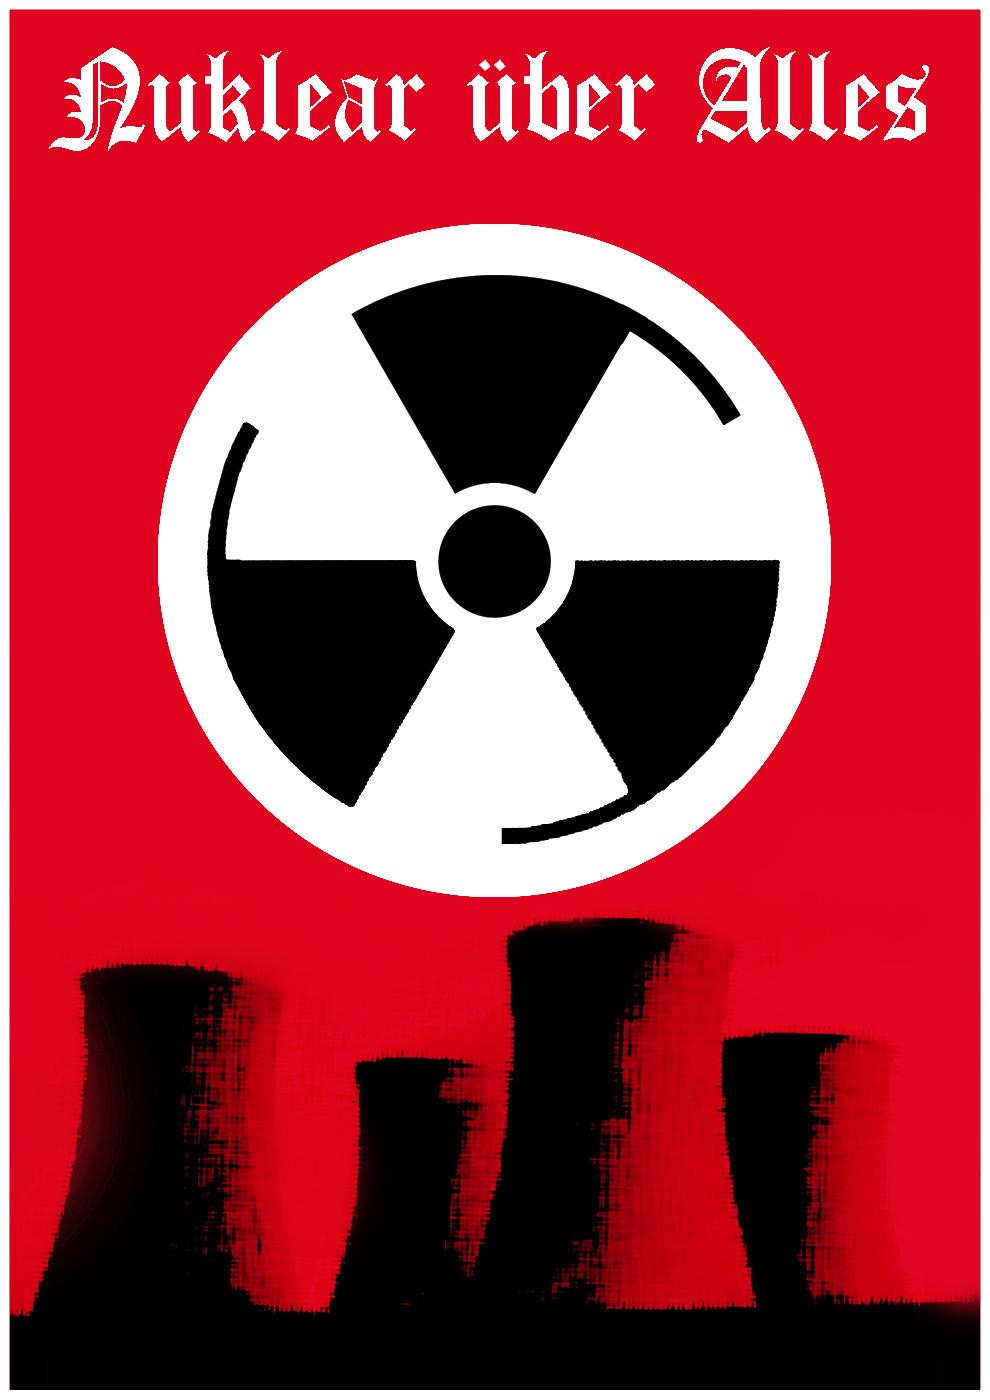 nuklear uber alles - graficanera - NO COPYRIGHT